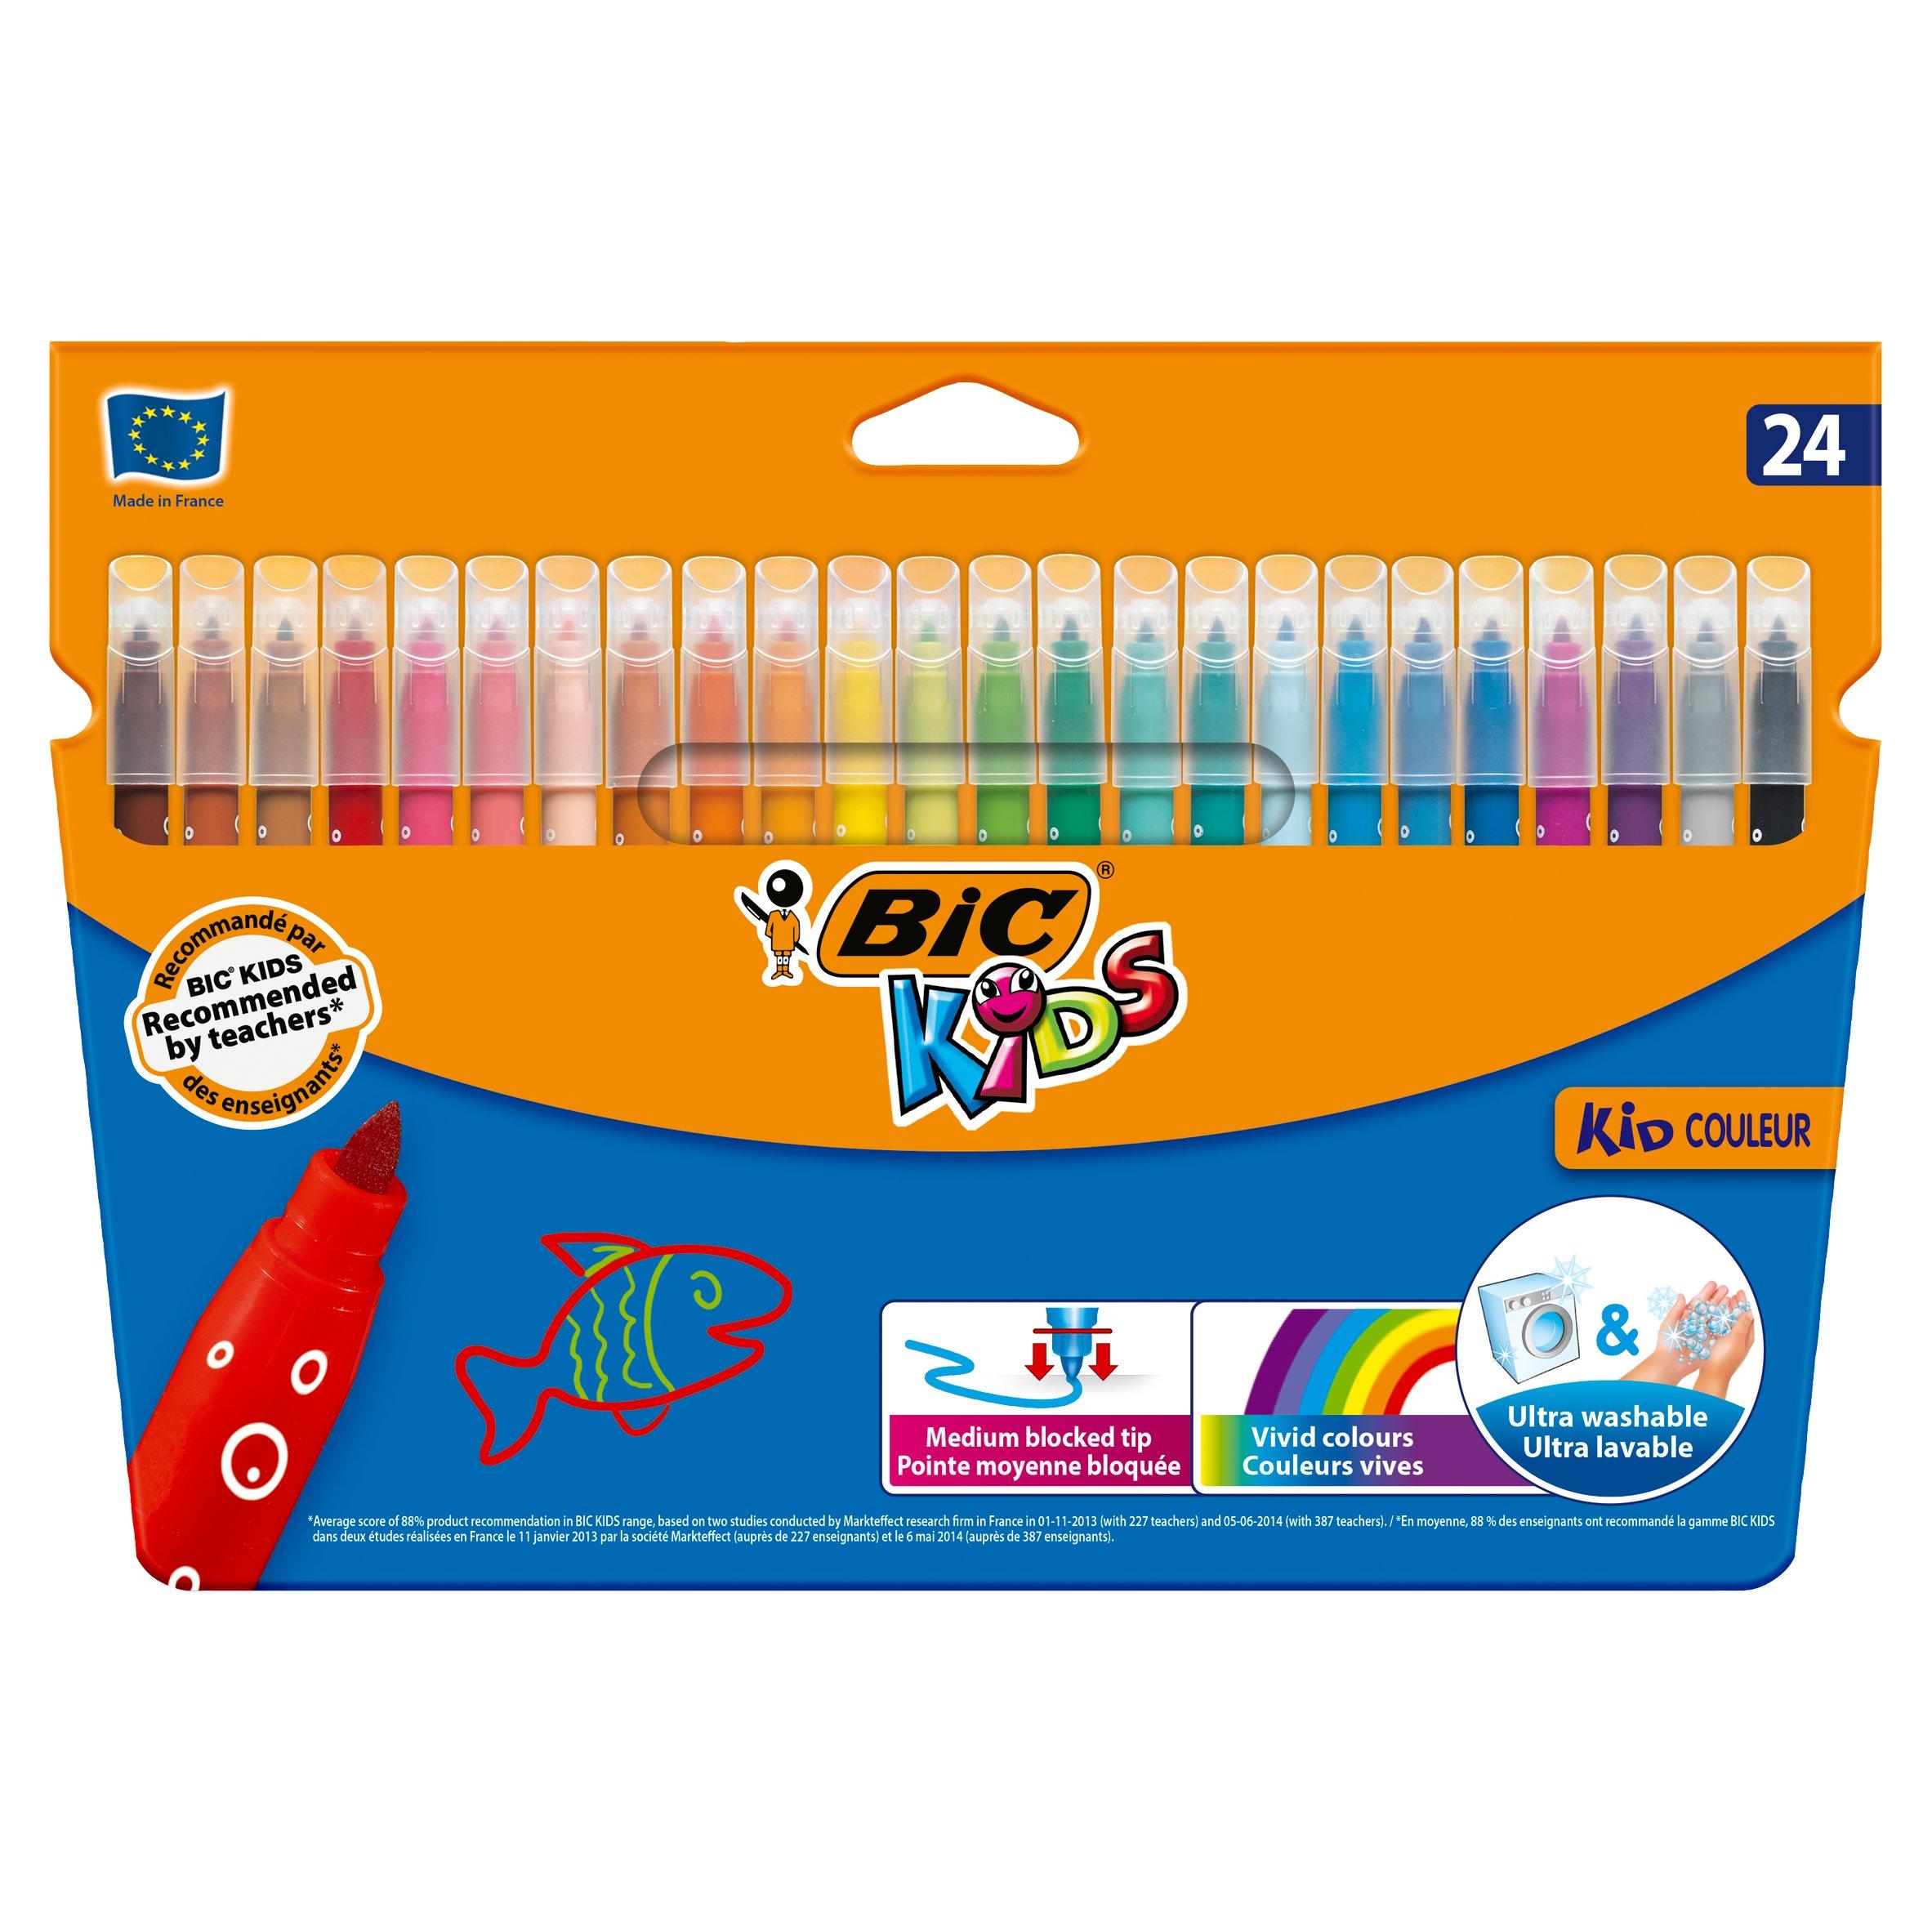 Box of 24 BIC Kids Visa Colouring Pens Blue